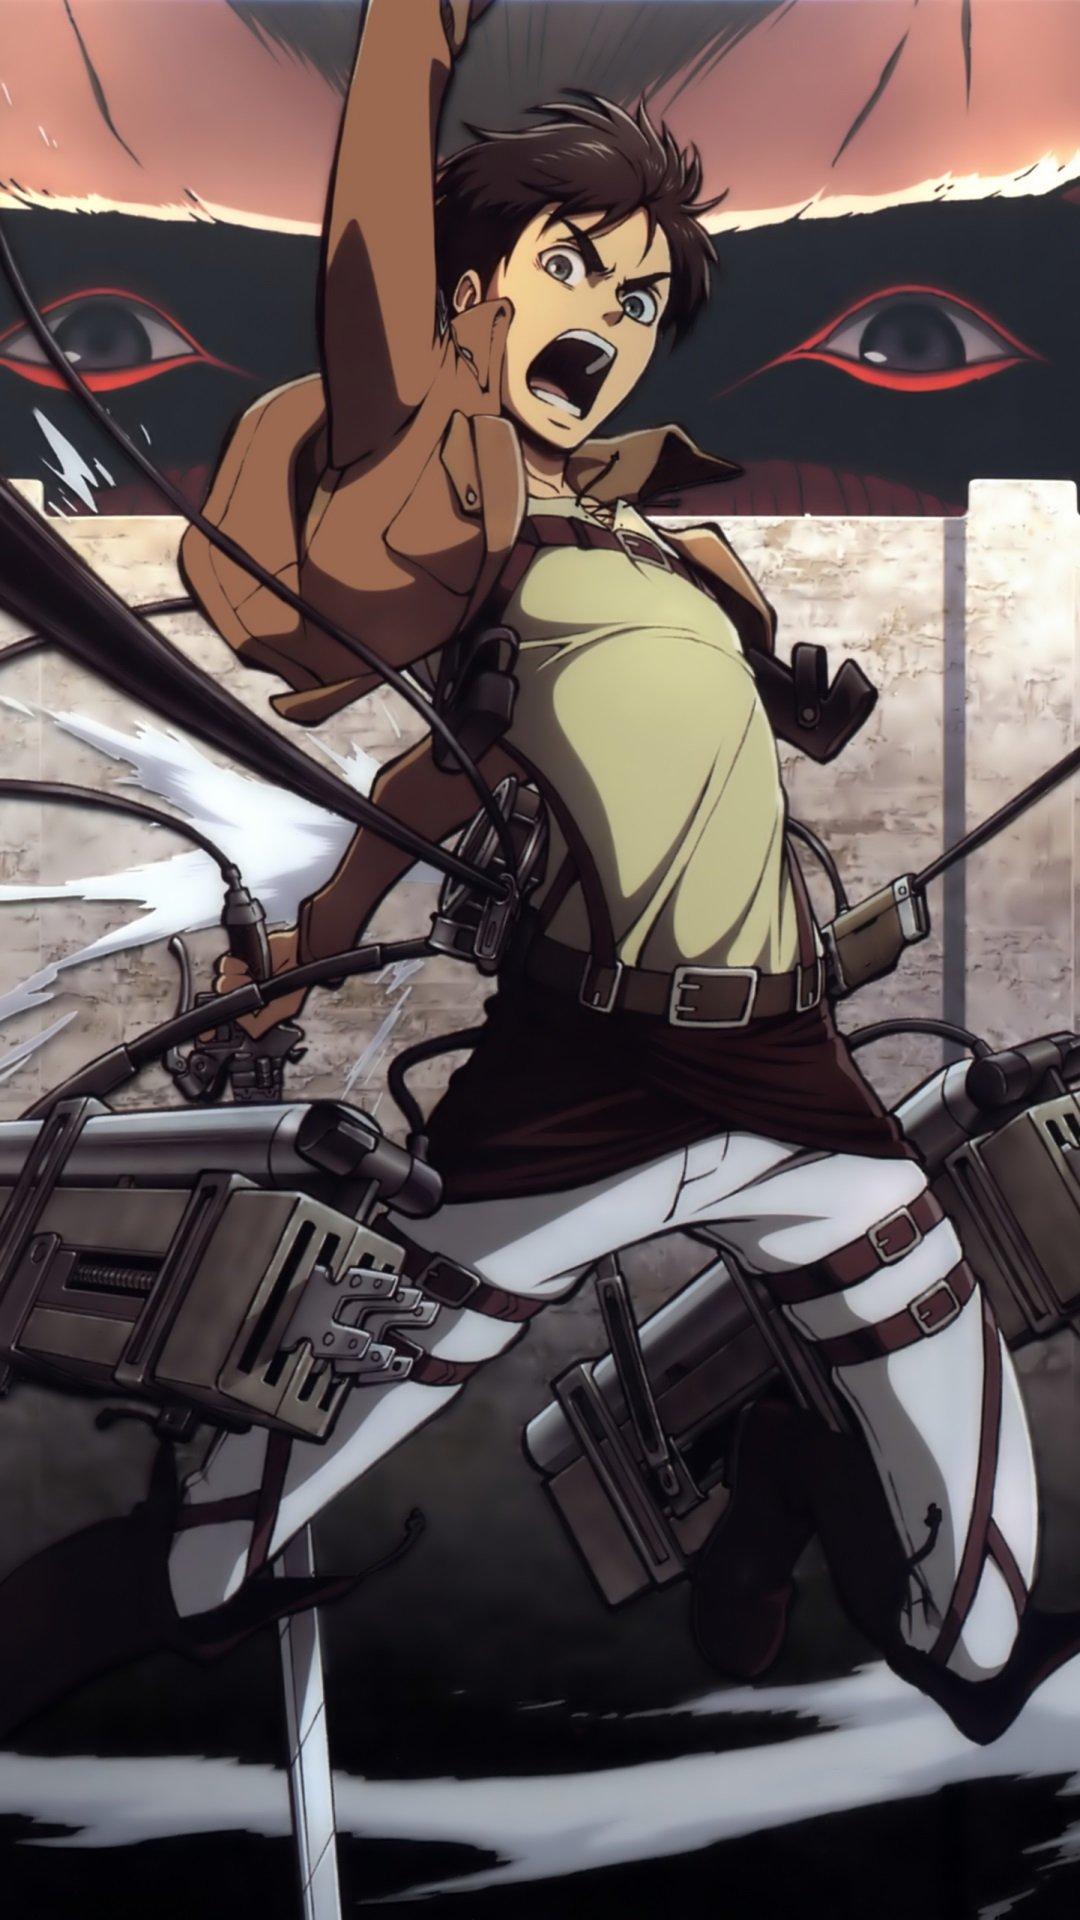 Attack On Titan Iphone Wallpaper Eren Shingeki no kyojineren jaeger 1080x1920